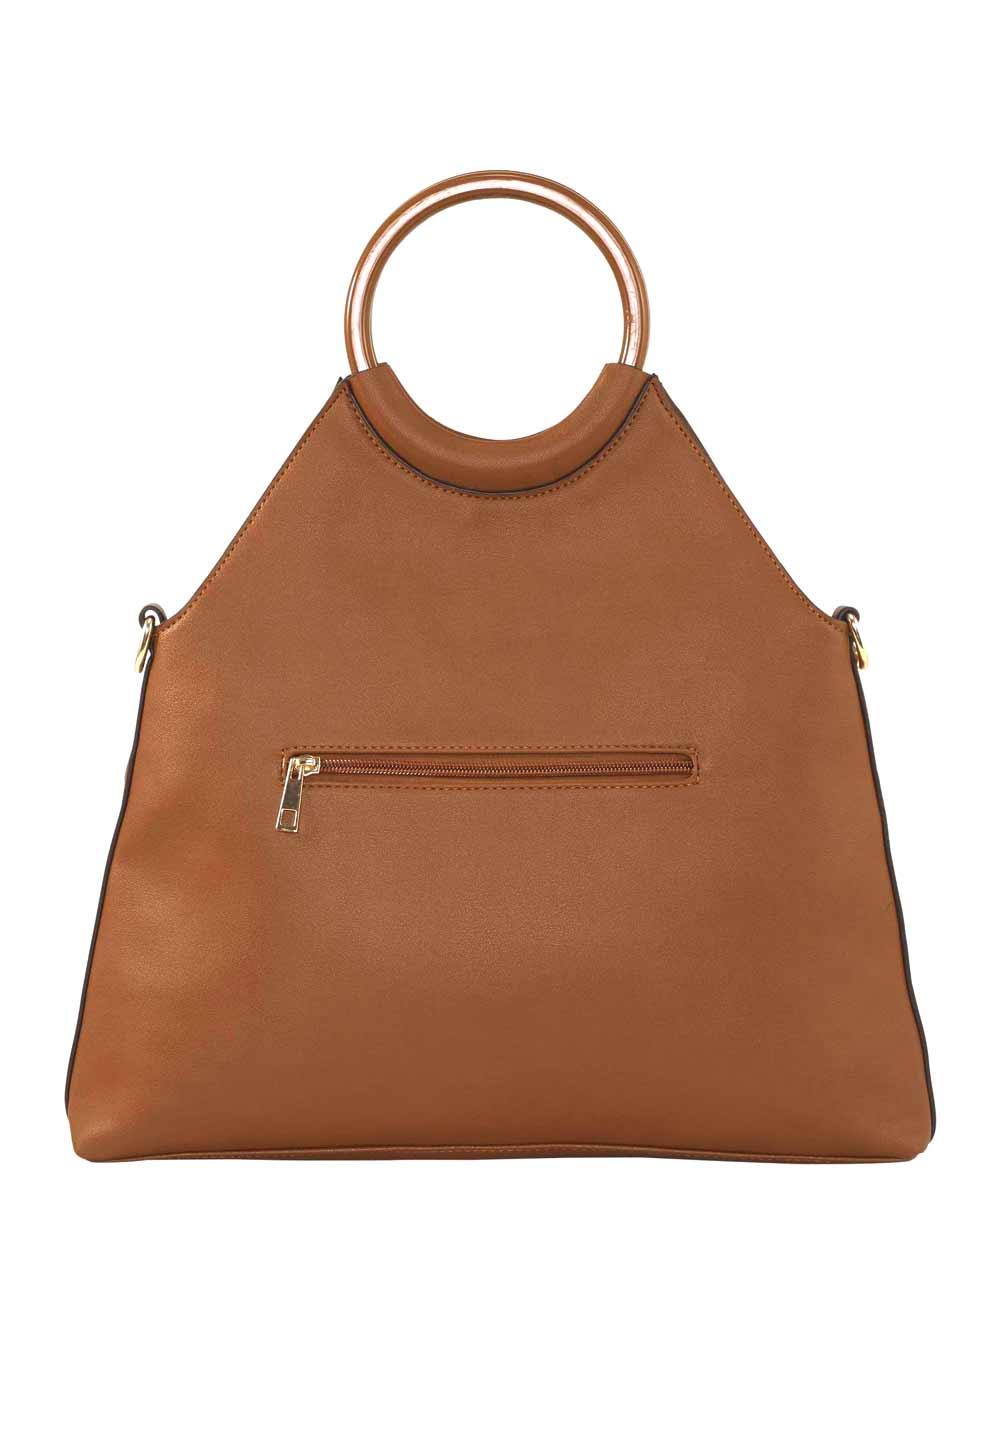 223.648 HEINE Damen Designer-Handtasche Cognac